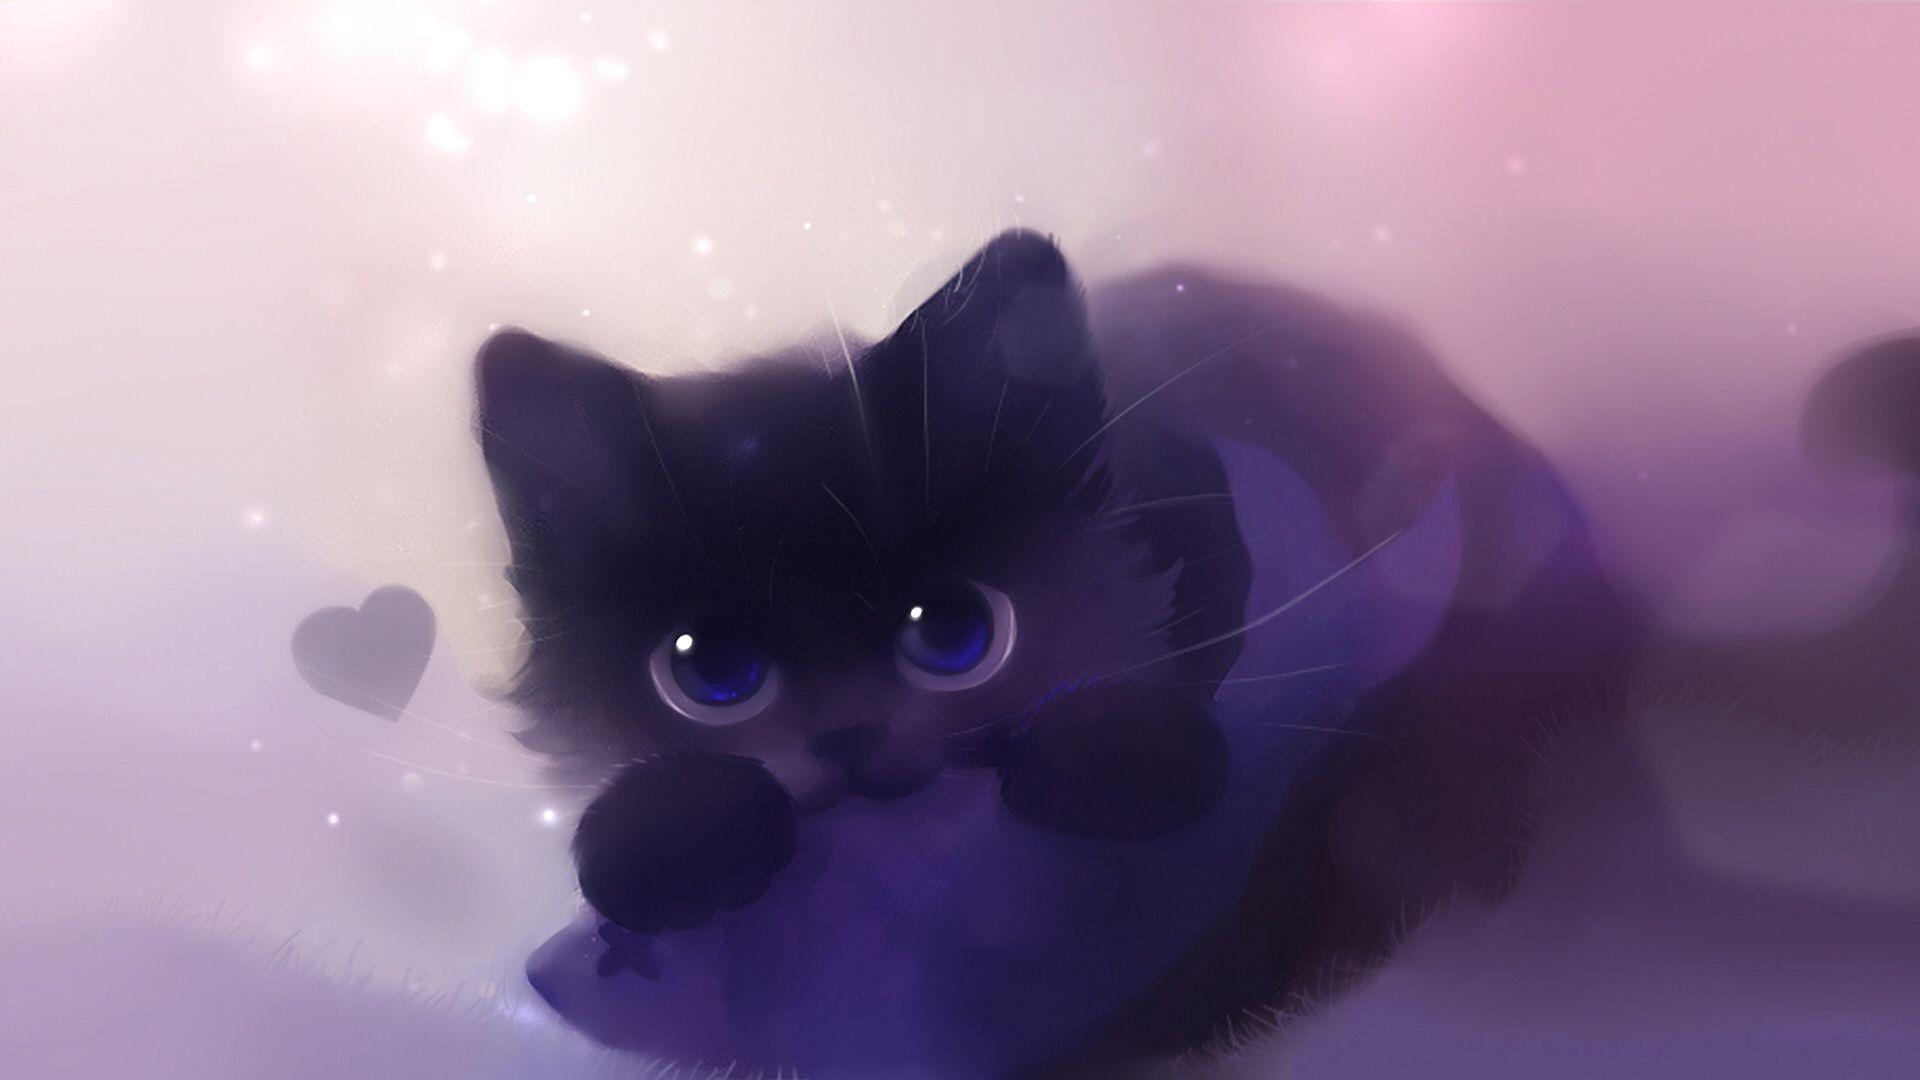 Pin By Megan Dawson On Adorable Animals Black Cat Anime Cat Art Cute Anime Cat